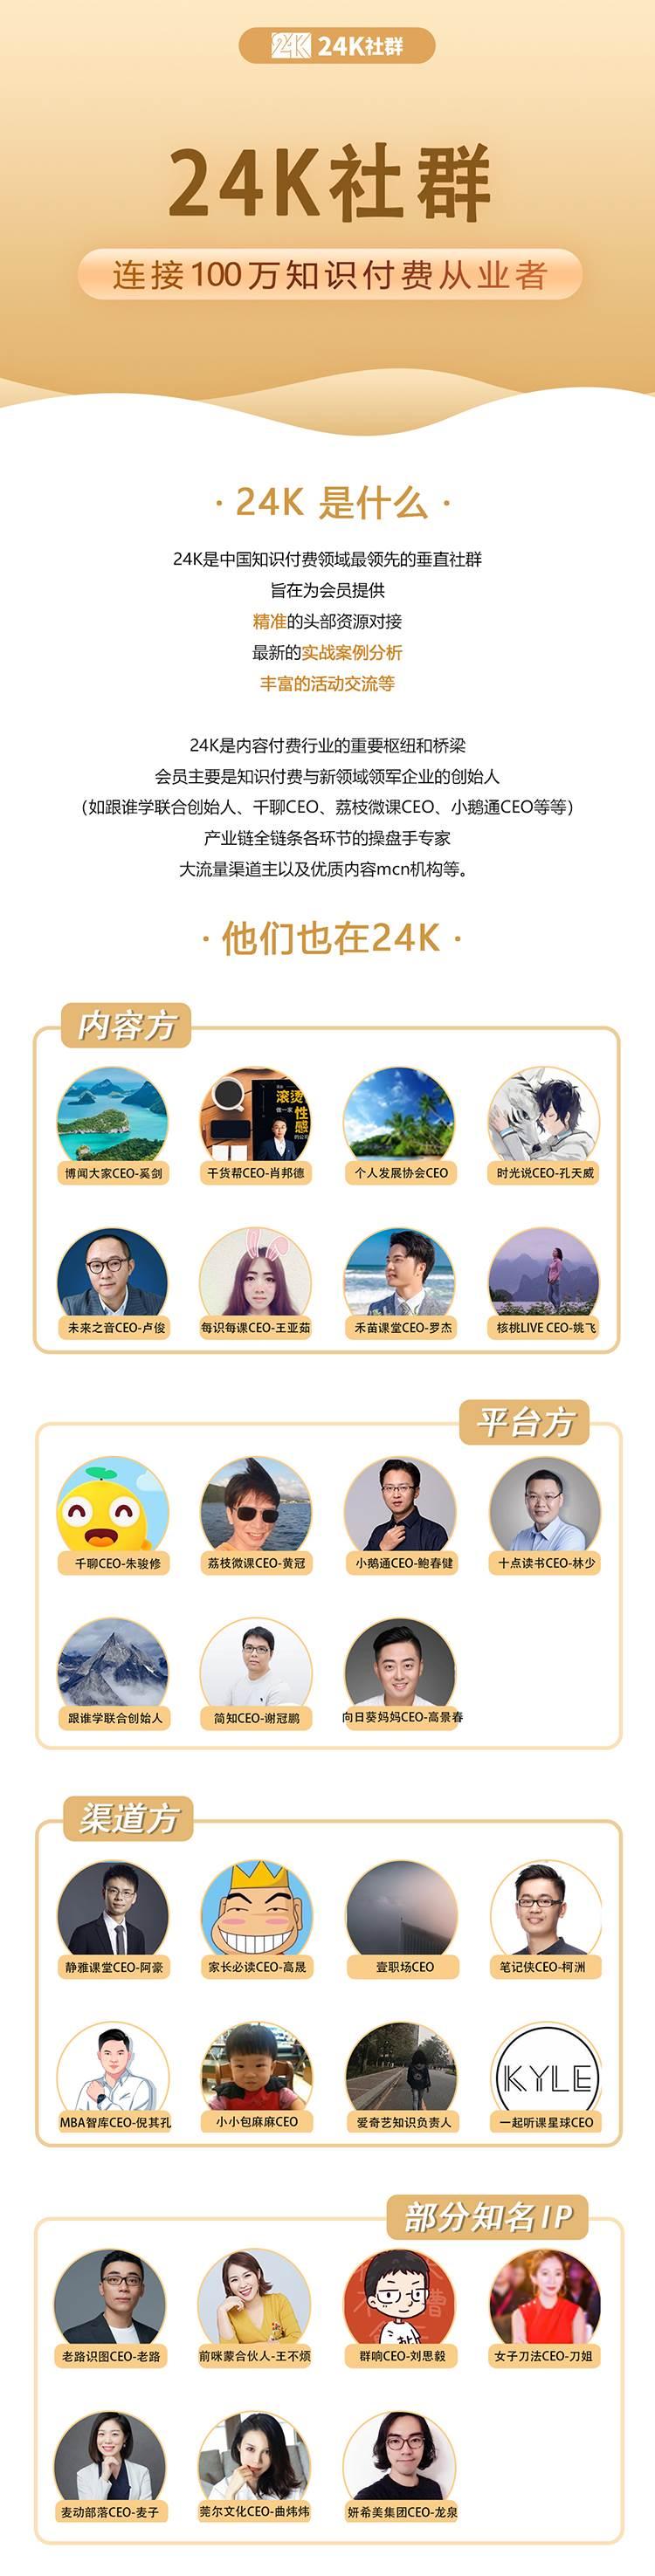 24K会员招募海报-2020最新_01.jpg